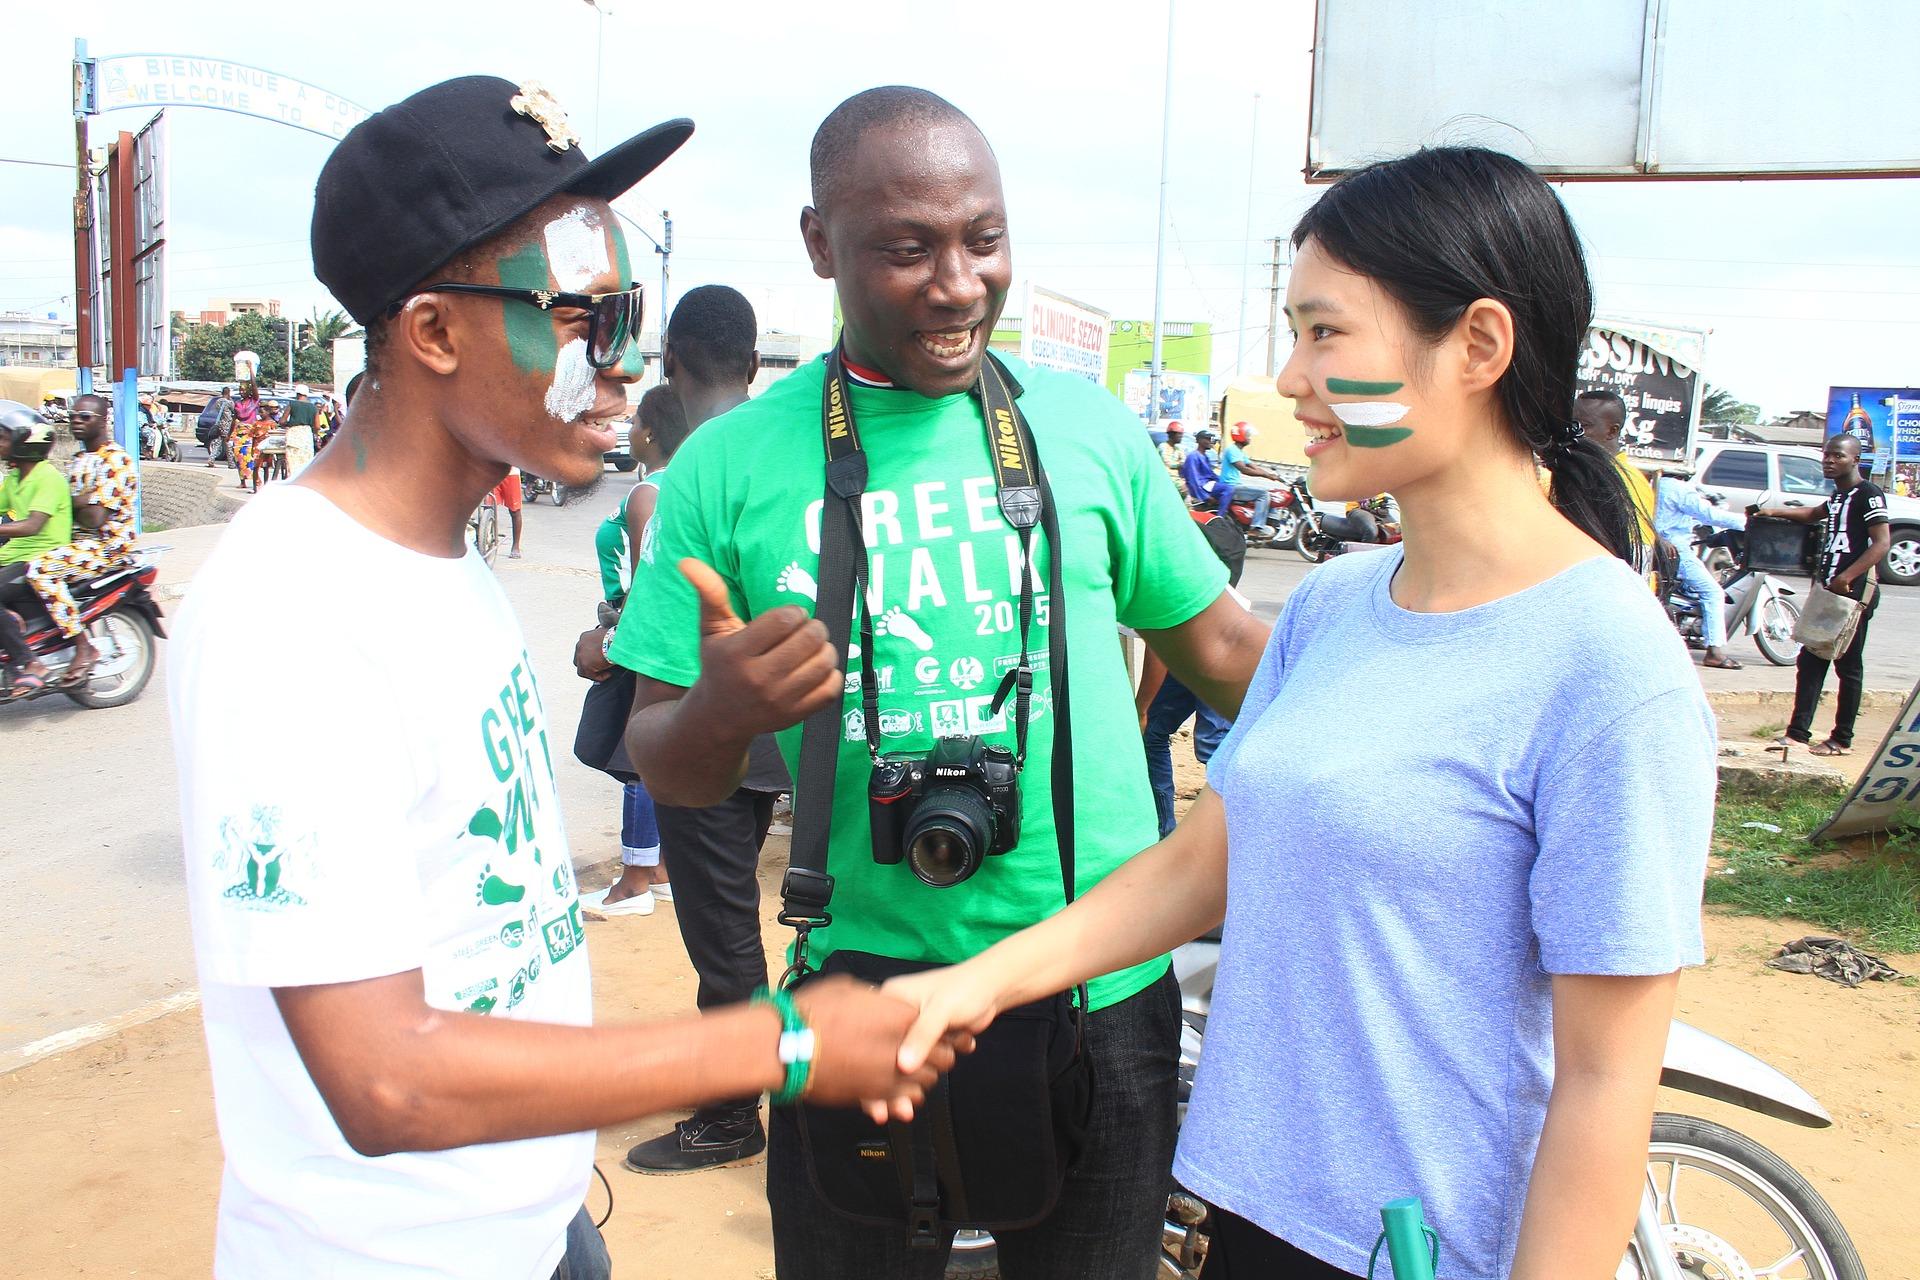 handshake between 2 people in Lagos Nigeria